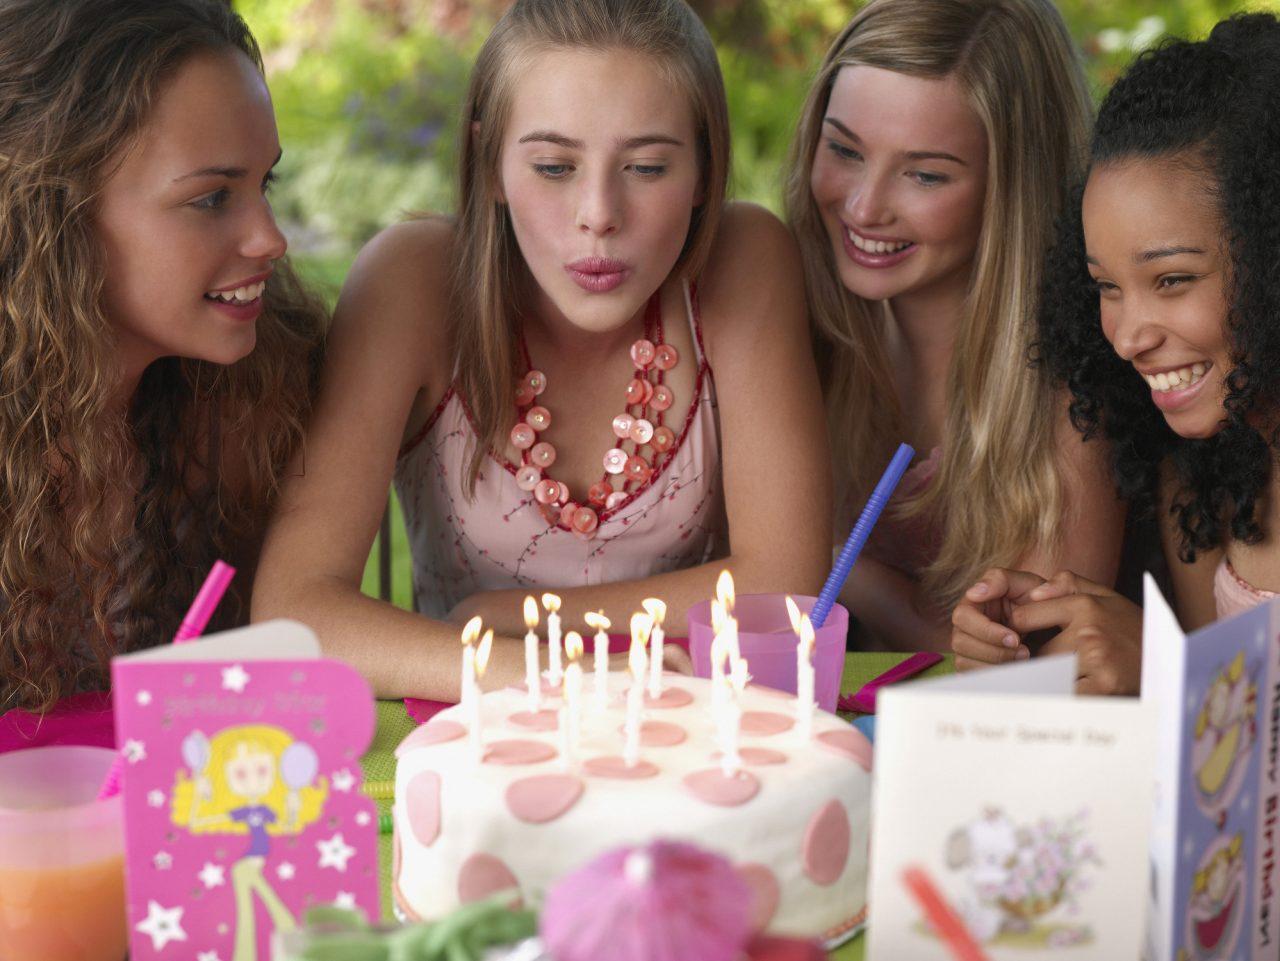 4 tenåringsjenter i bursdag